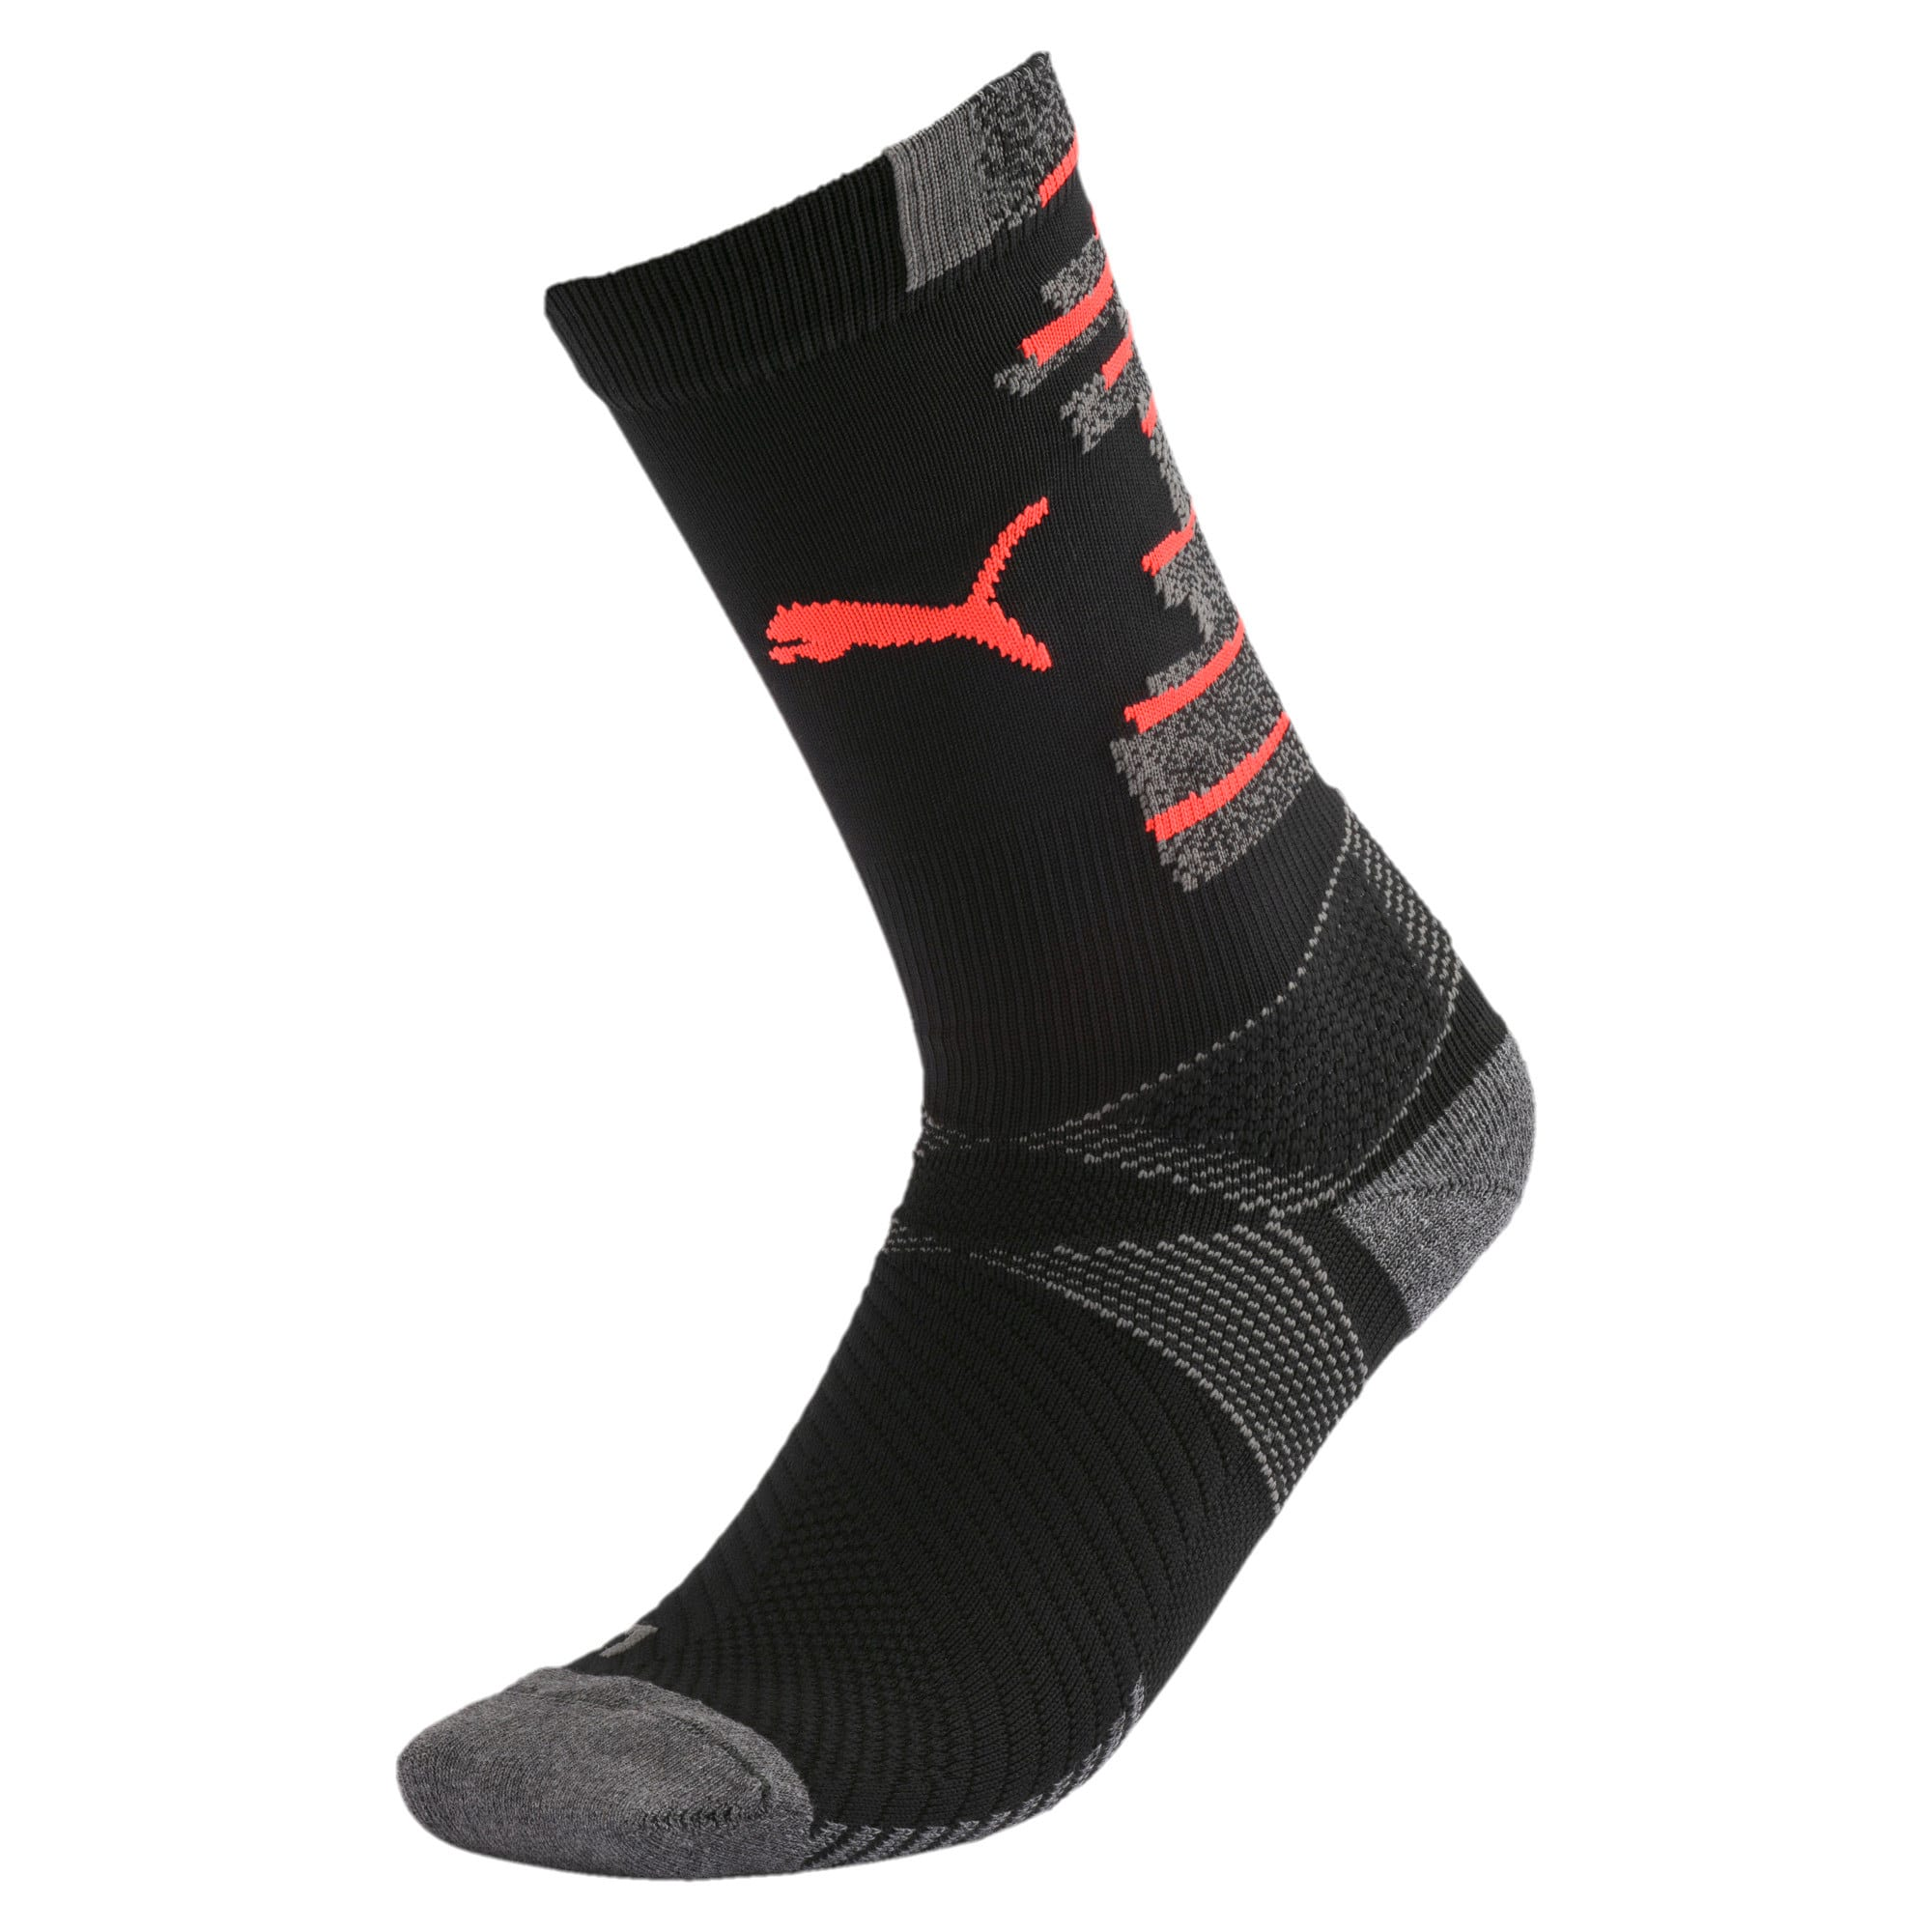 Thumbnail 1 of ftblNXT Men's Socks, Puma Black-Nrgy Red, medium